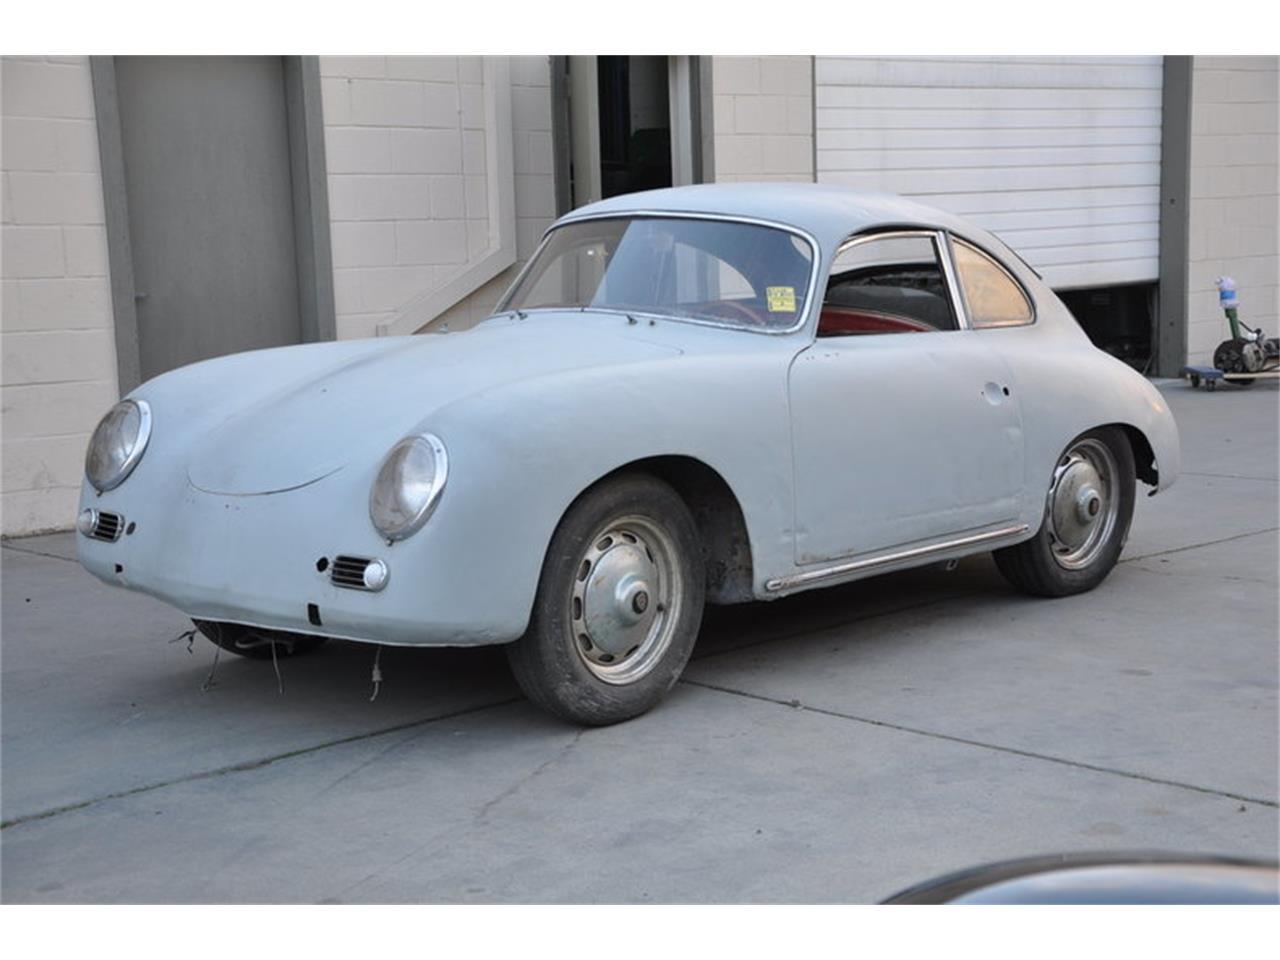 Porsche 356 For Sale >> For Sale 1958 Porsche 356 In Costa Mesa California